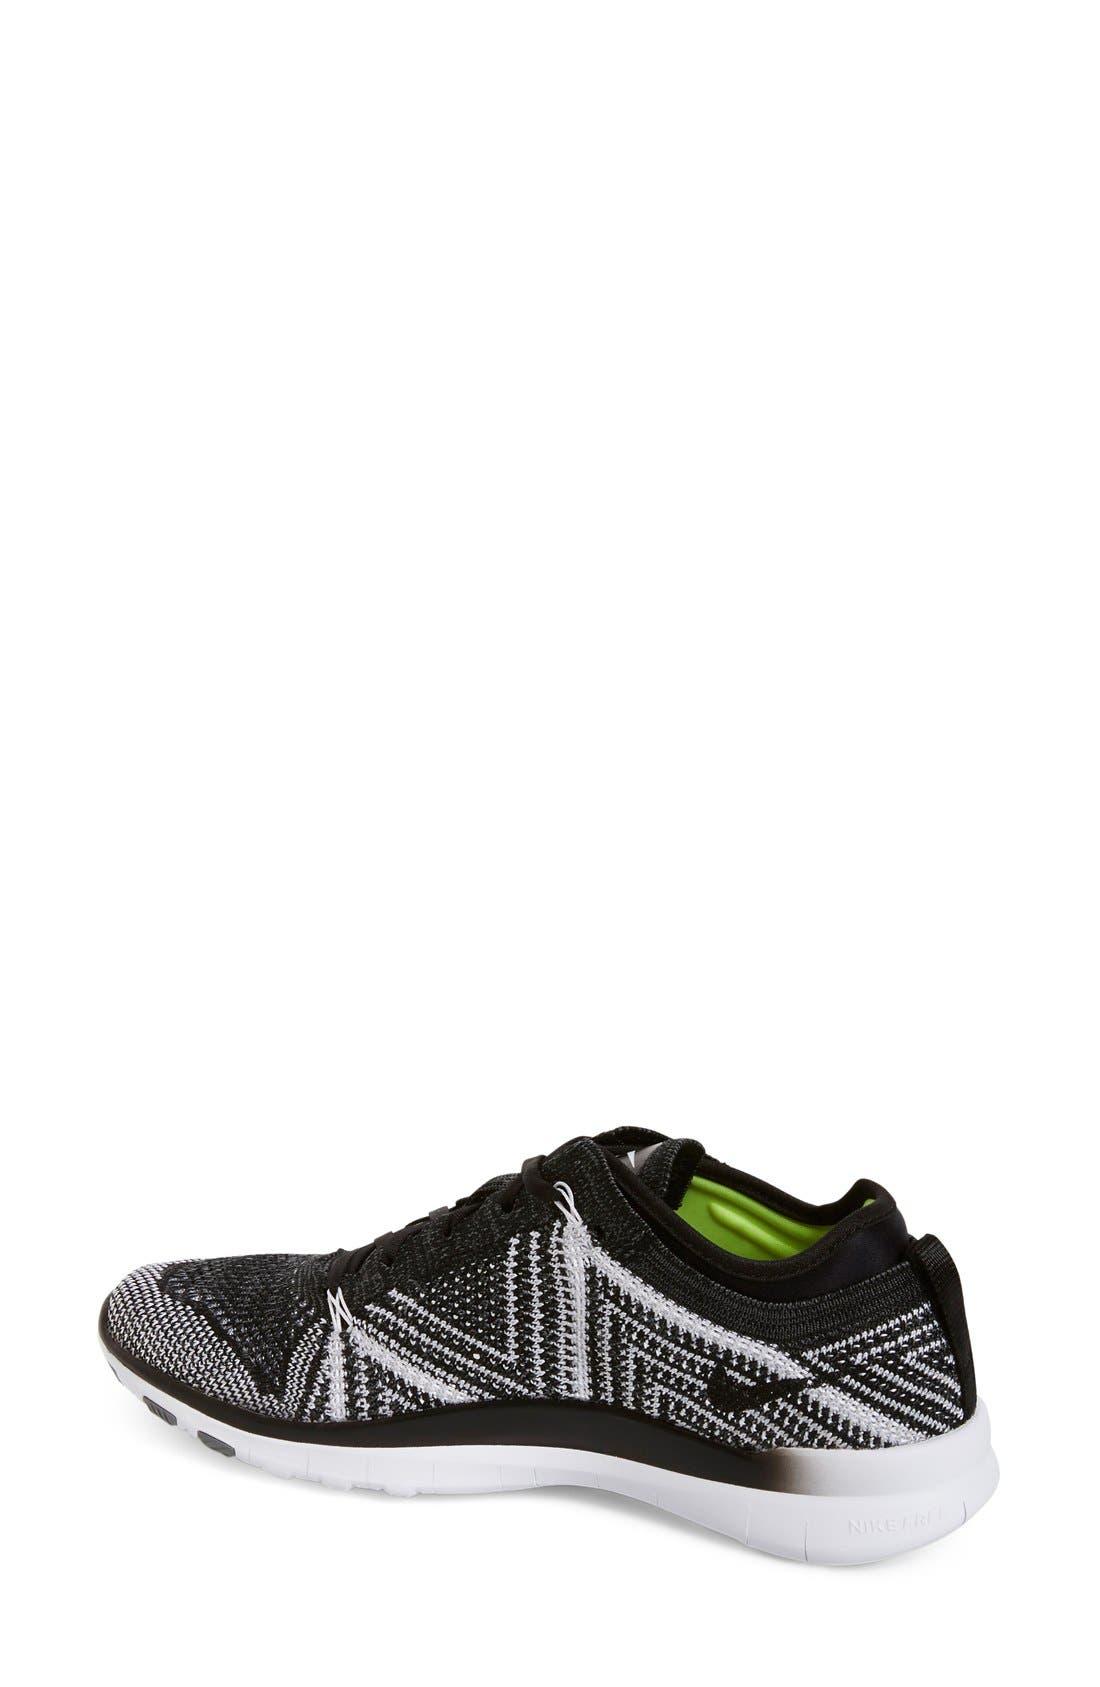 ,                             'Free Flyknit 5.0 TR' Training Shoe,                             Alternate thumbnail 9, color,                             004